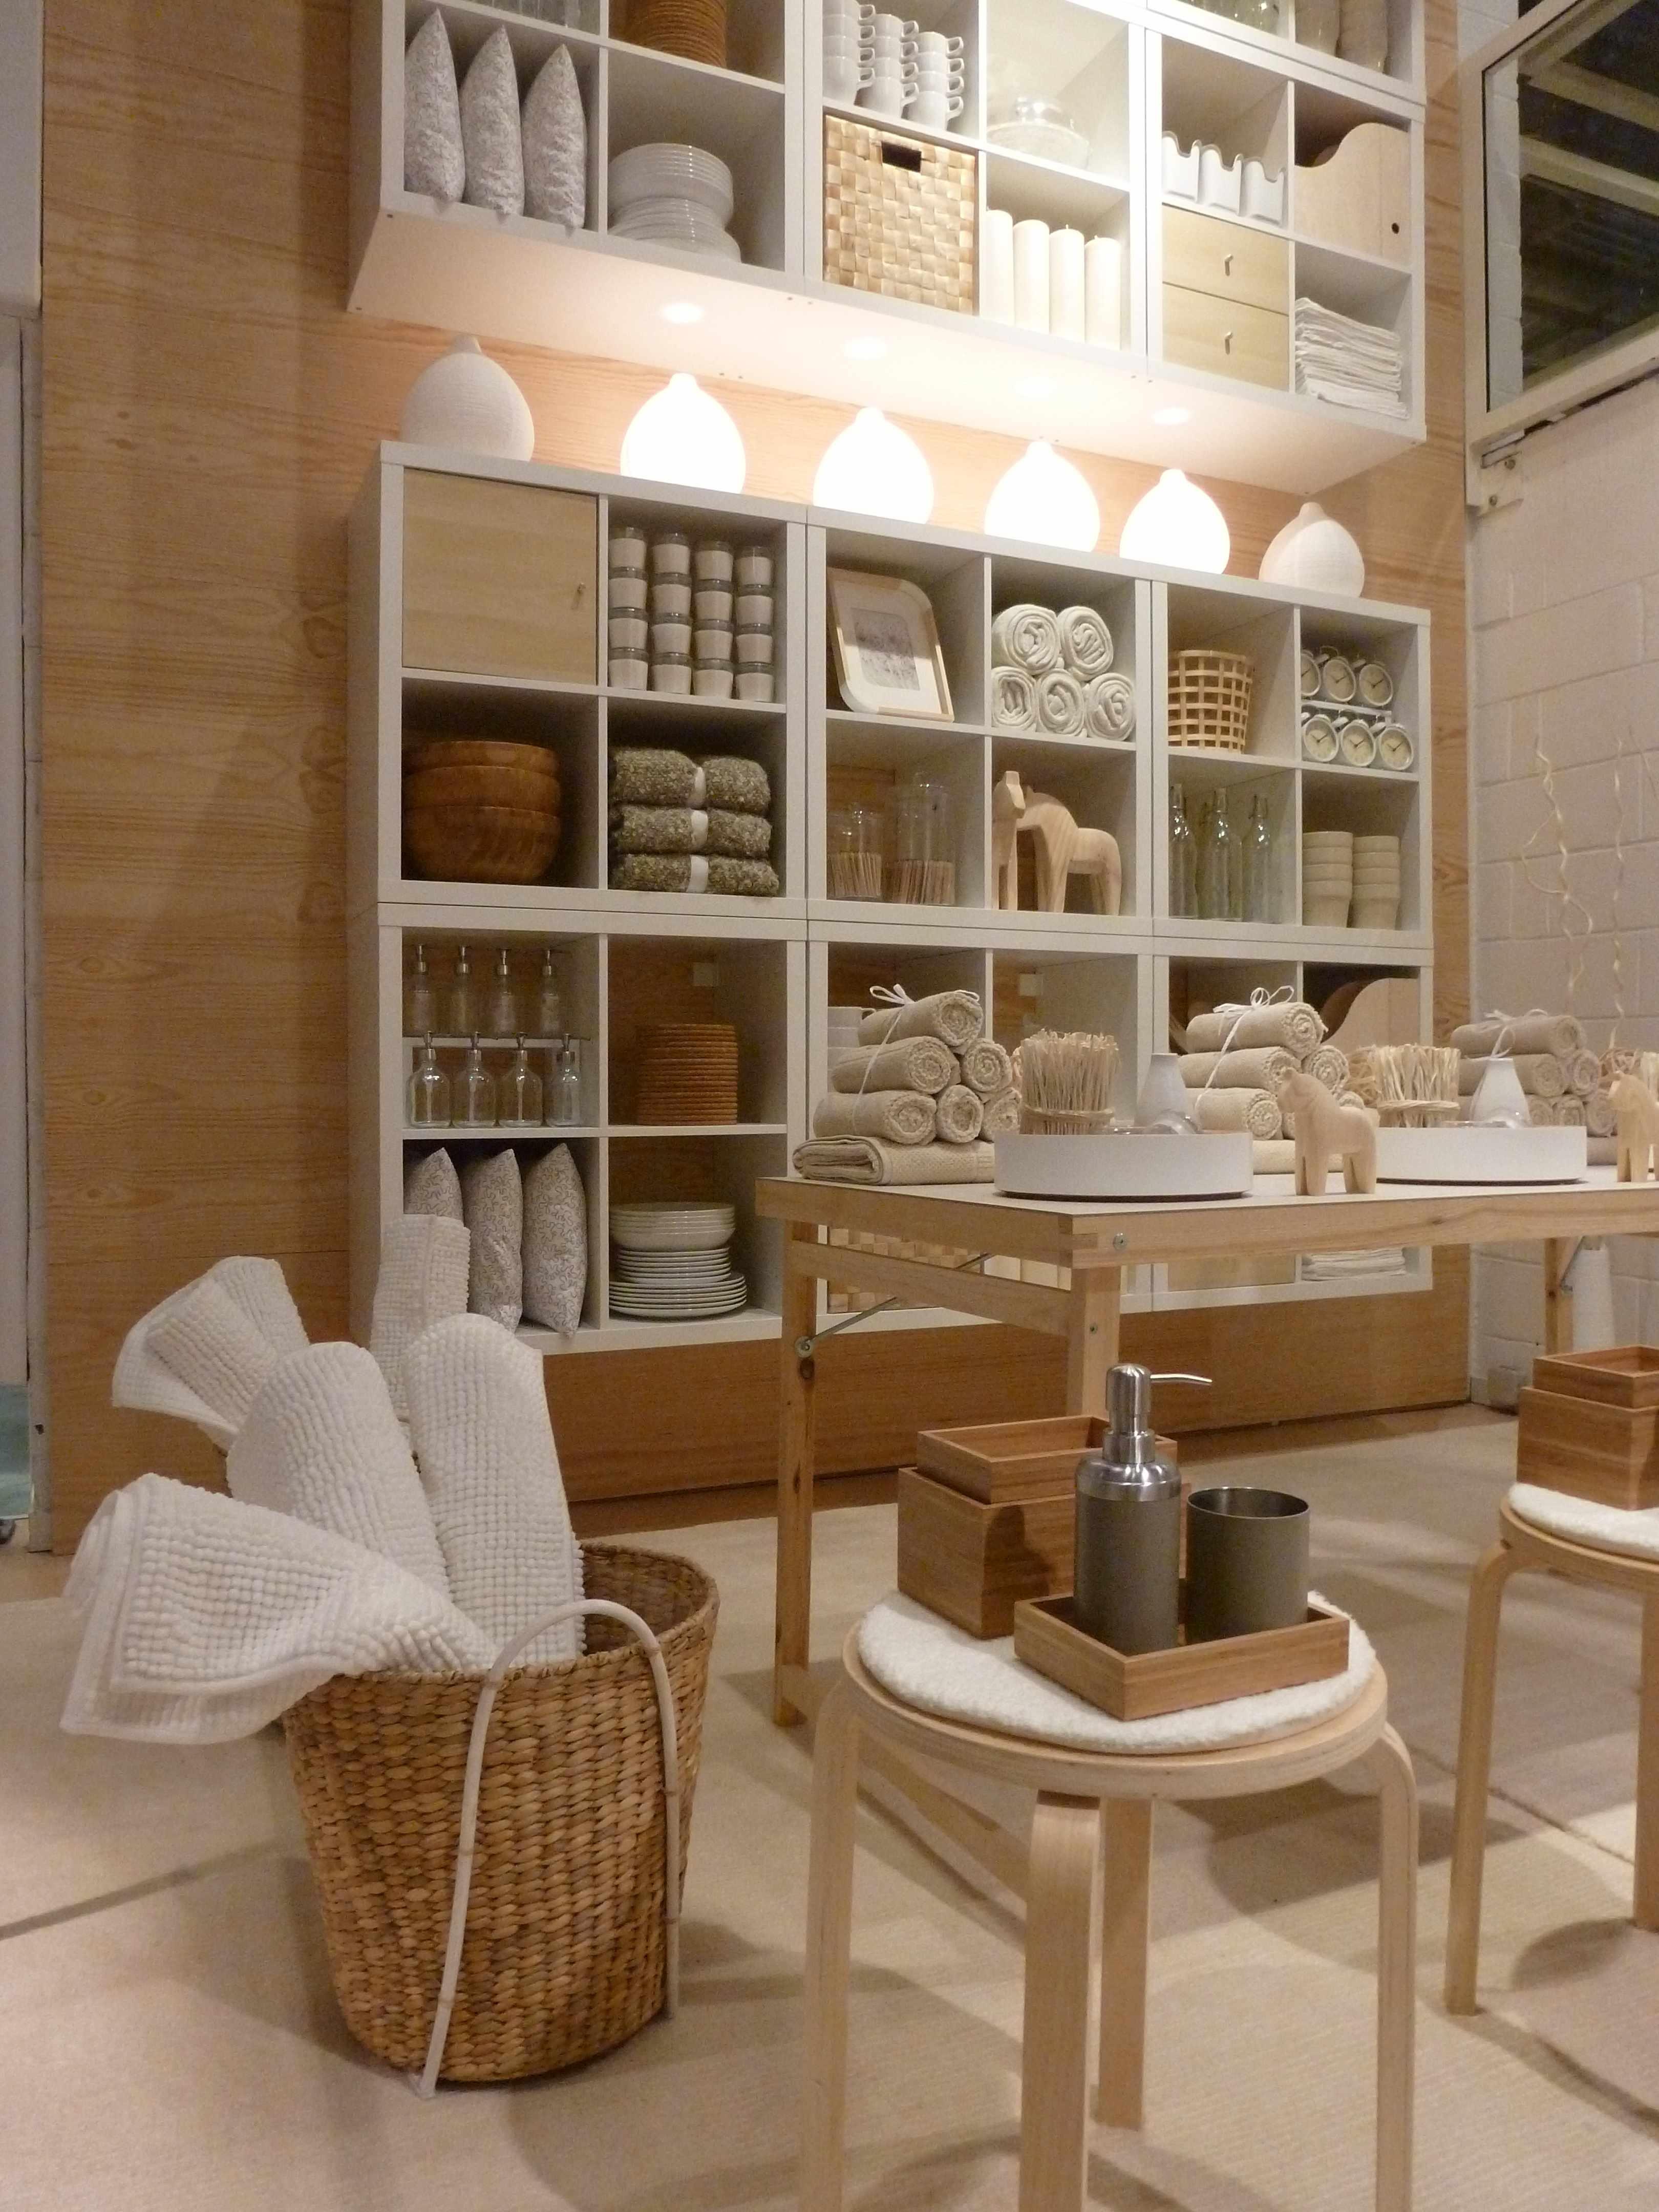 Logiciel Salle De Bain Ikea Meilleur De Photos Salles De Bain Ikea Perfect Armoire De toilette Salle De Bain Ikea